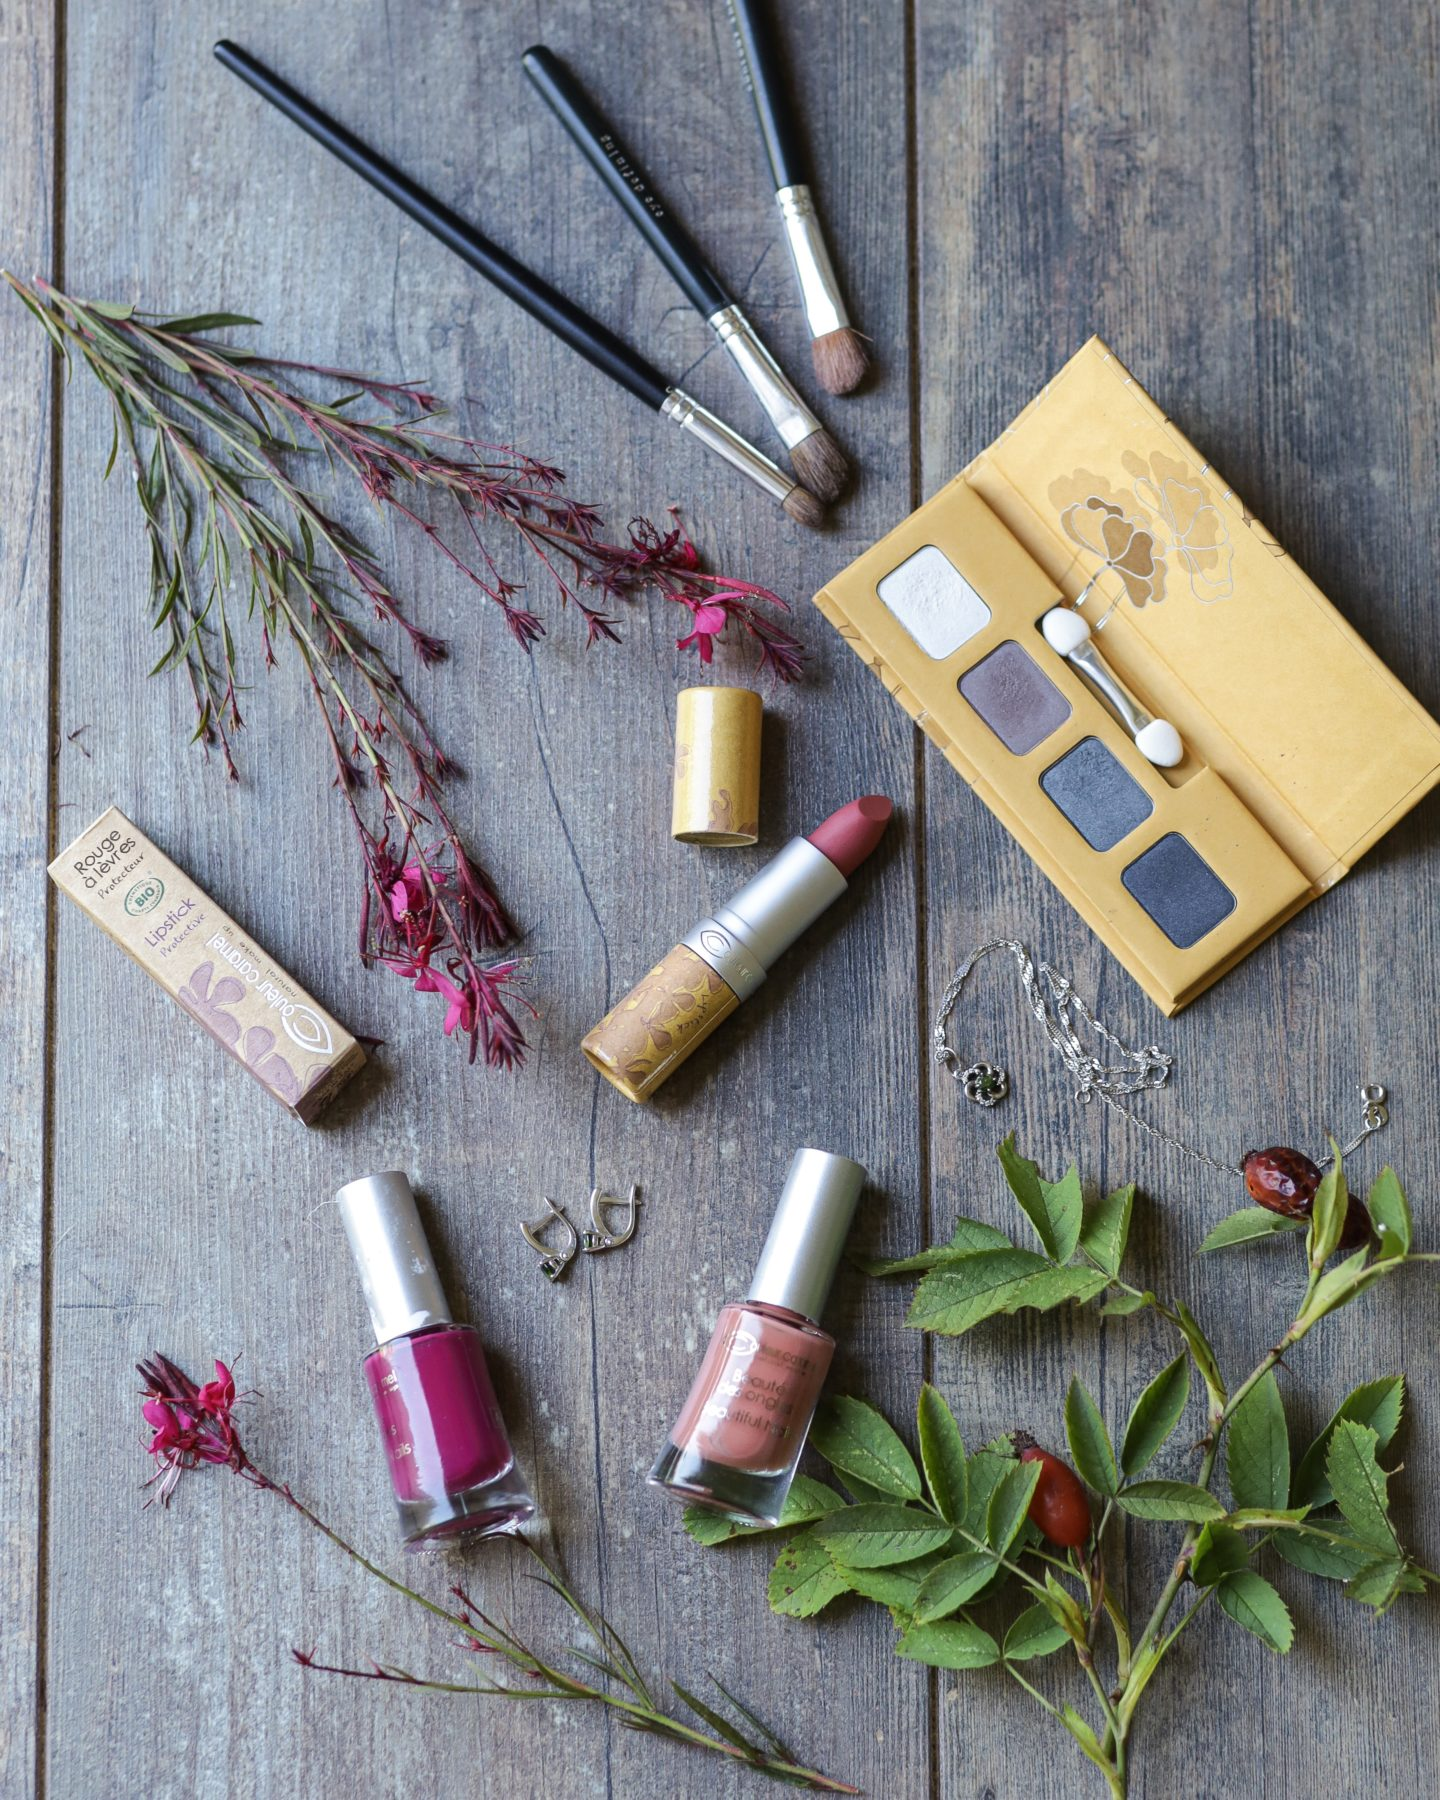 Collection de maquillage Urban Nature marque Couleur Caramel